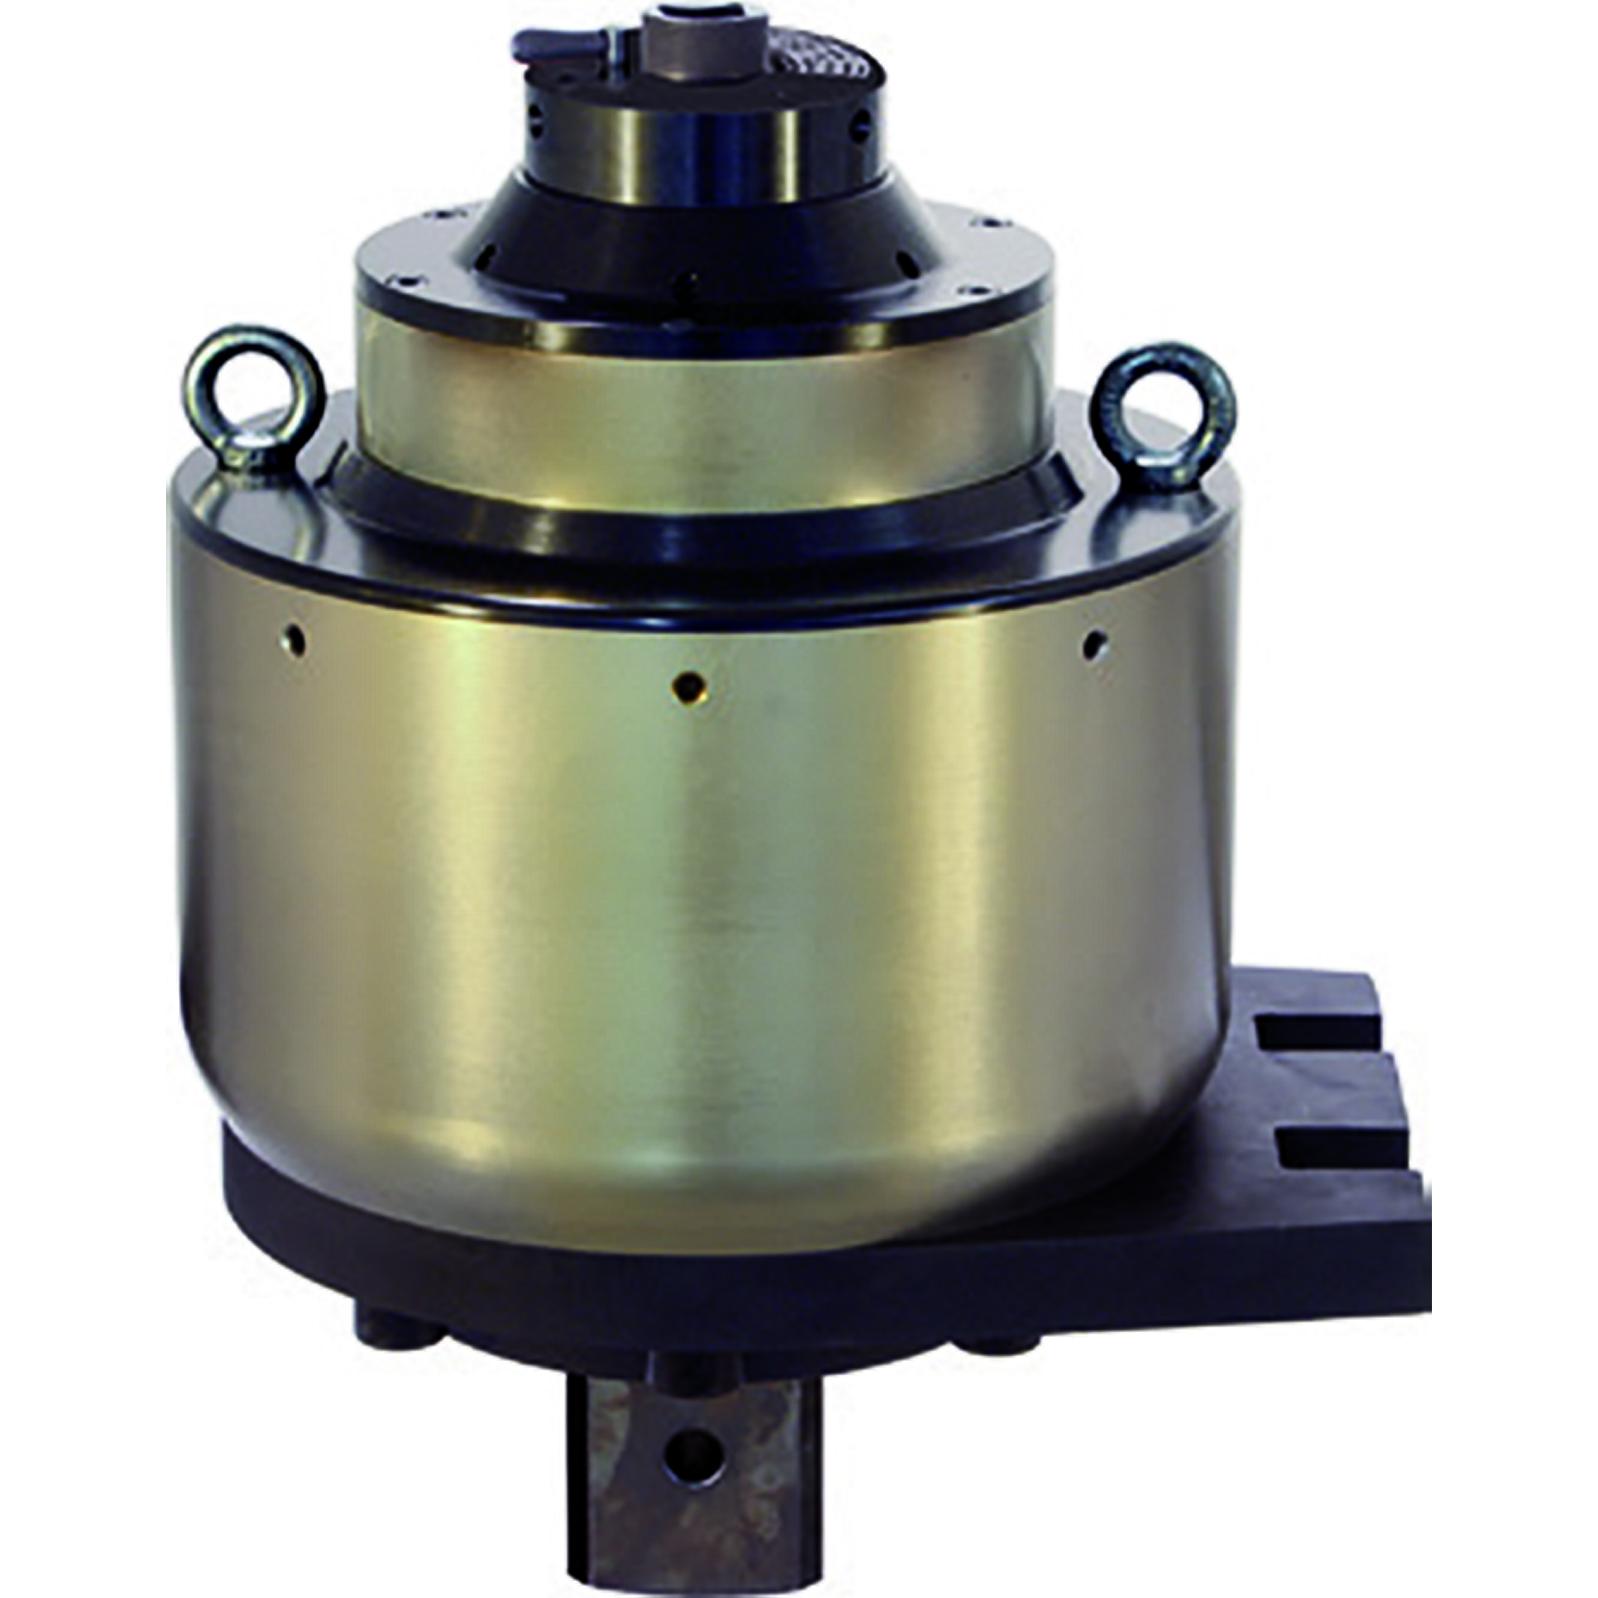 Multiplicador de torque LKV-550RS